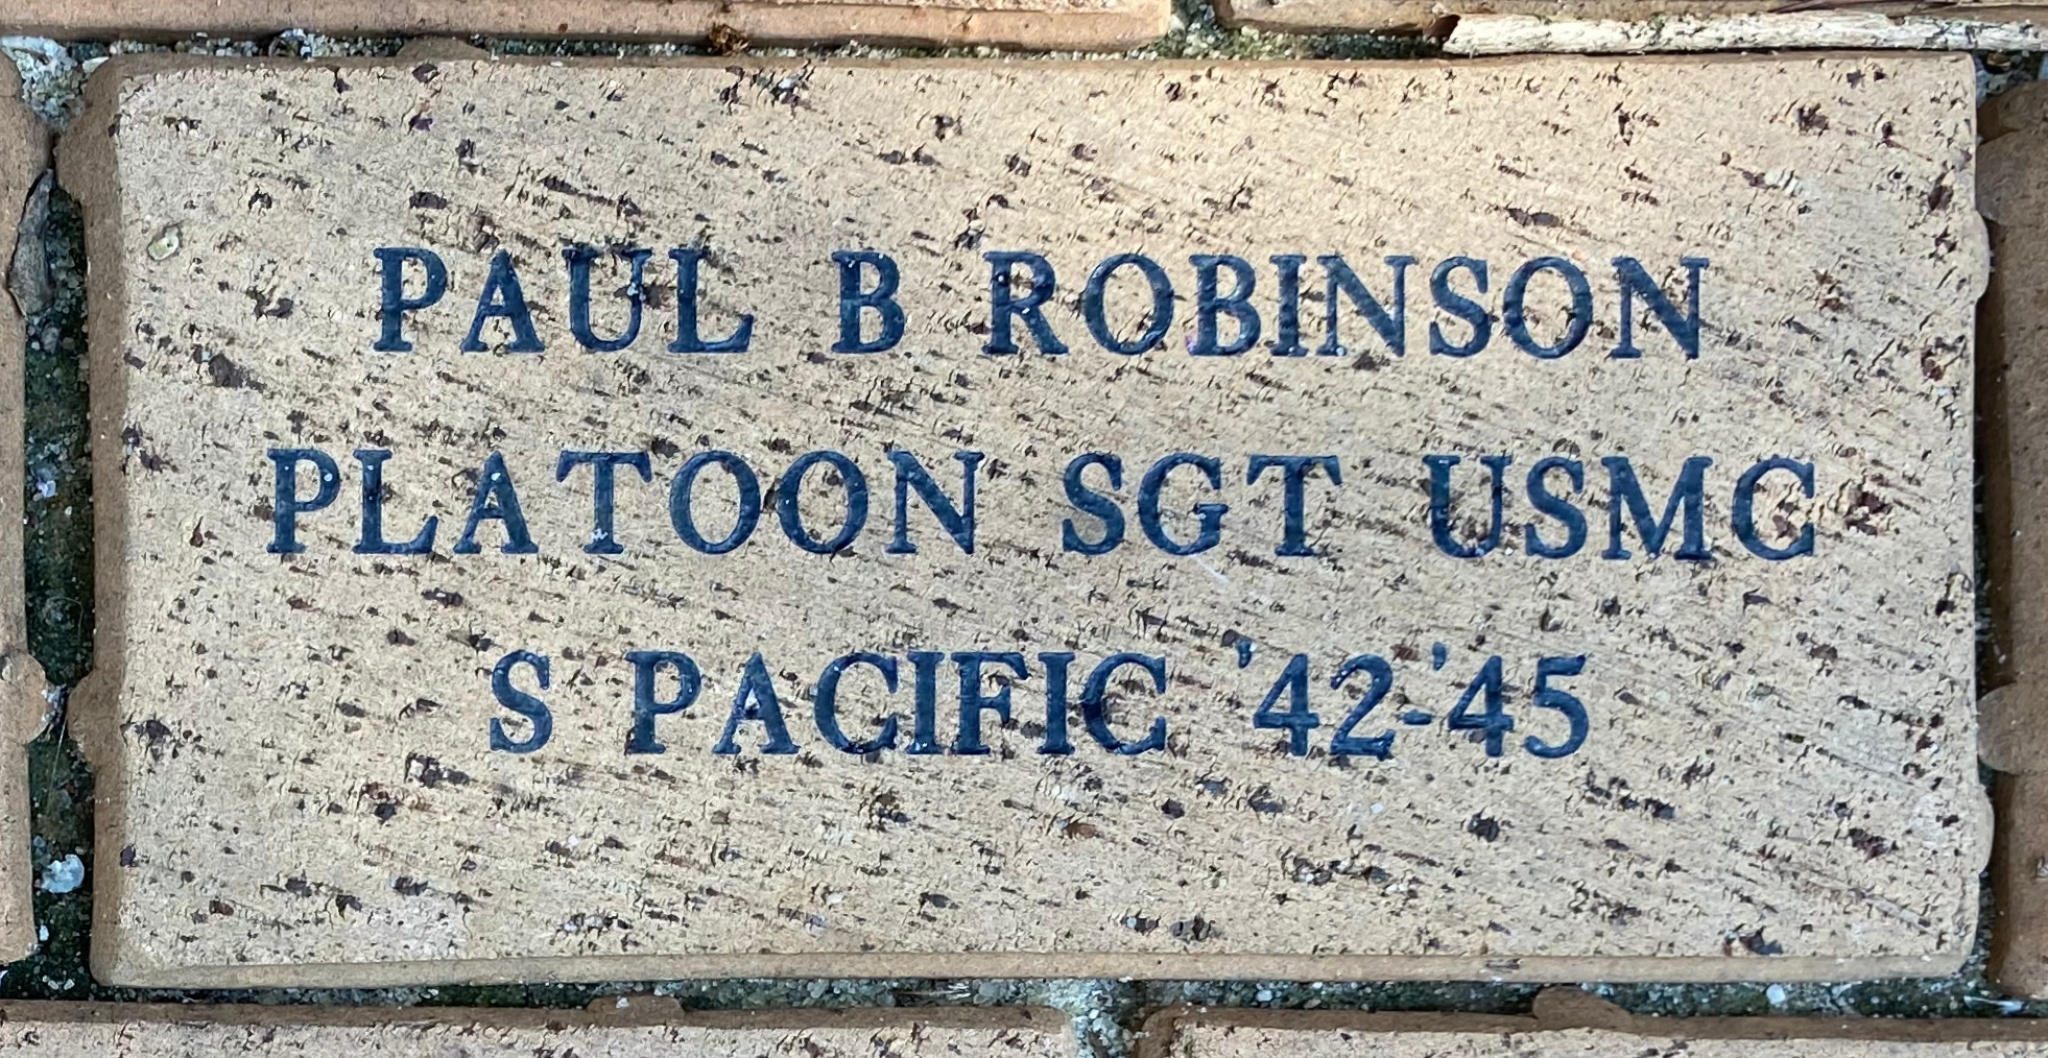 PAUL B ROBINSON PLATOON SGT USMC S PACIFIC '42-45